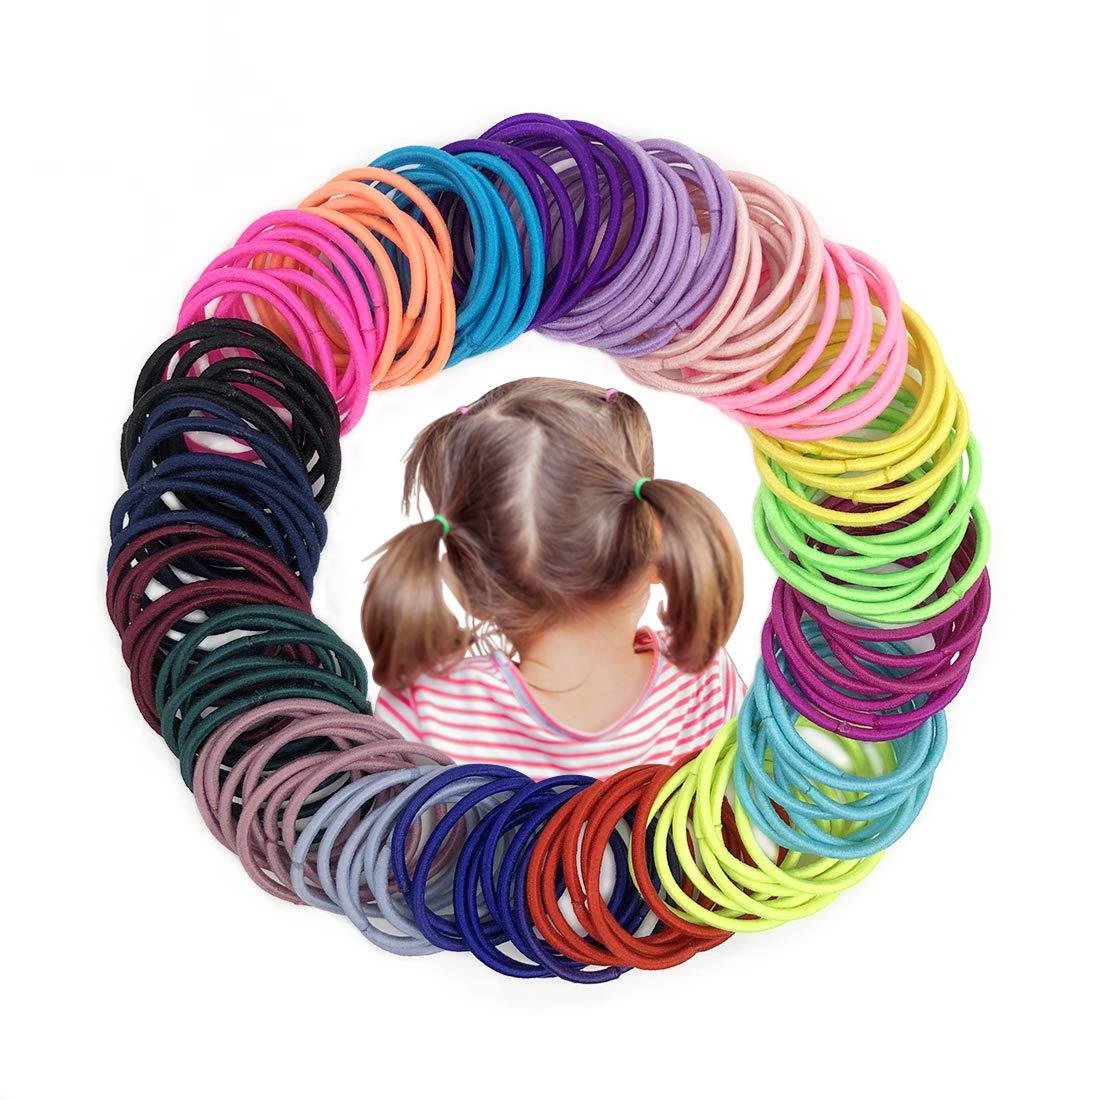 Joyeah Multicolor Ponytail Toddlers Diameter